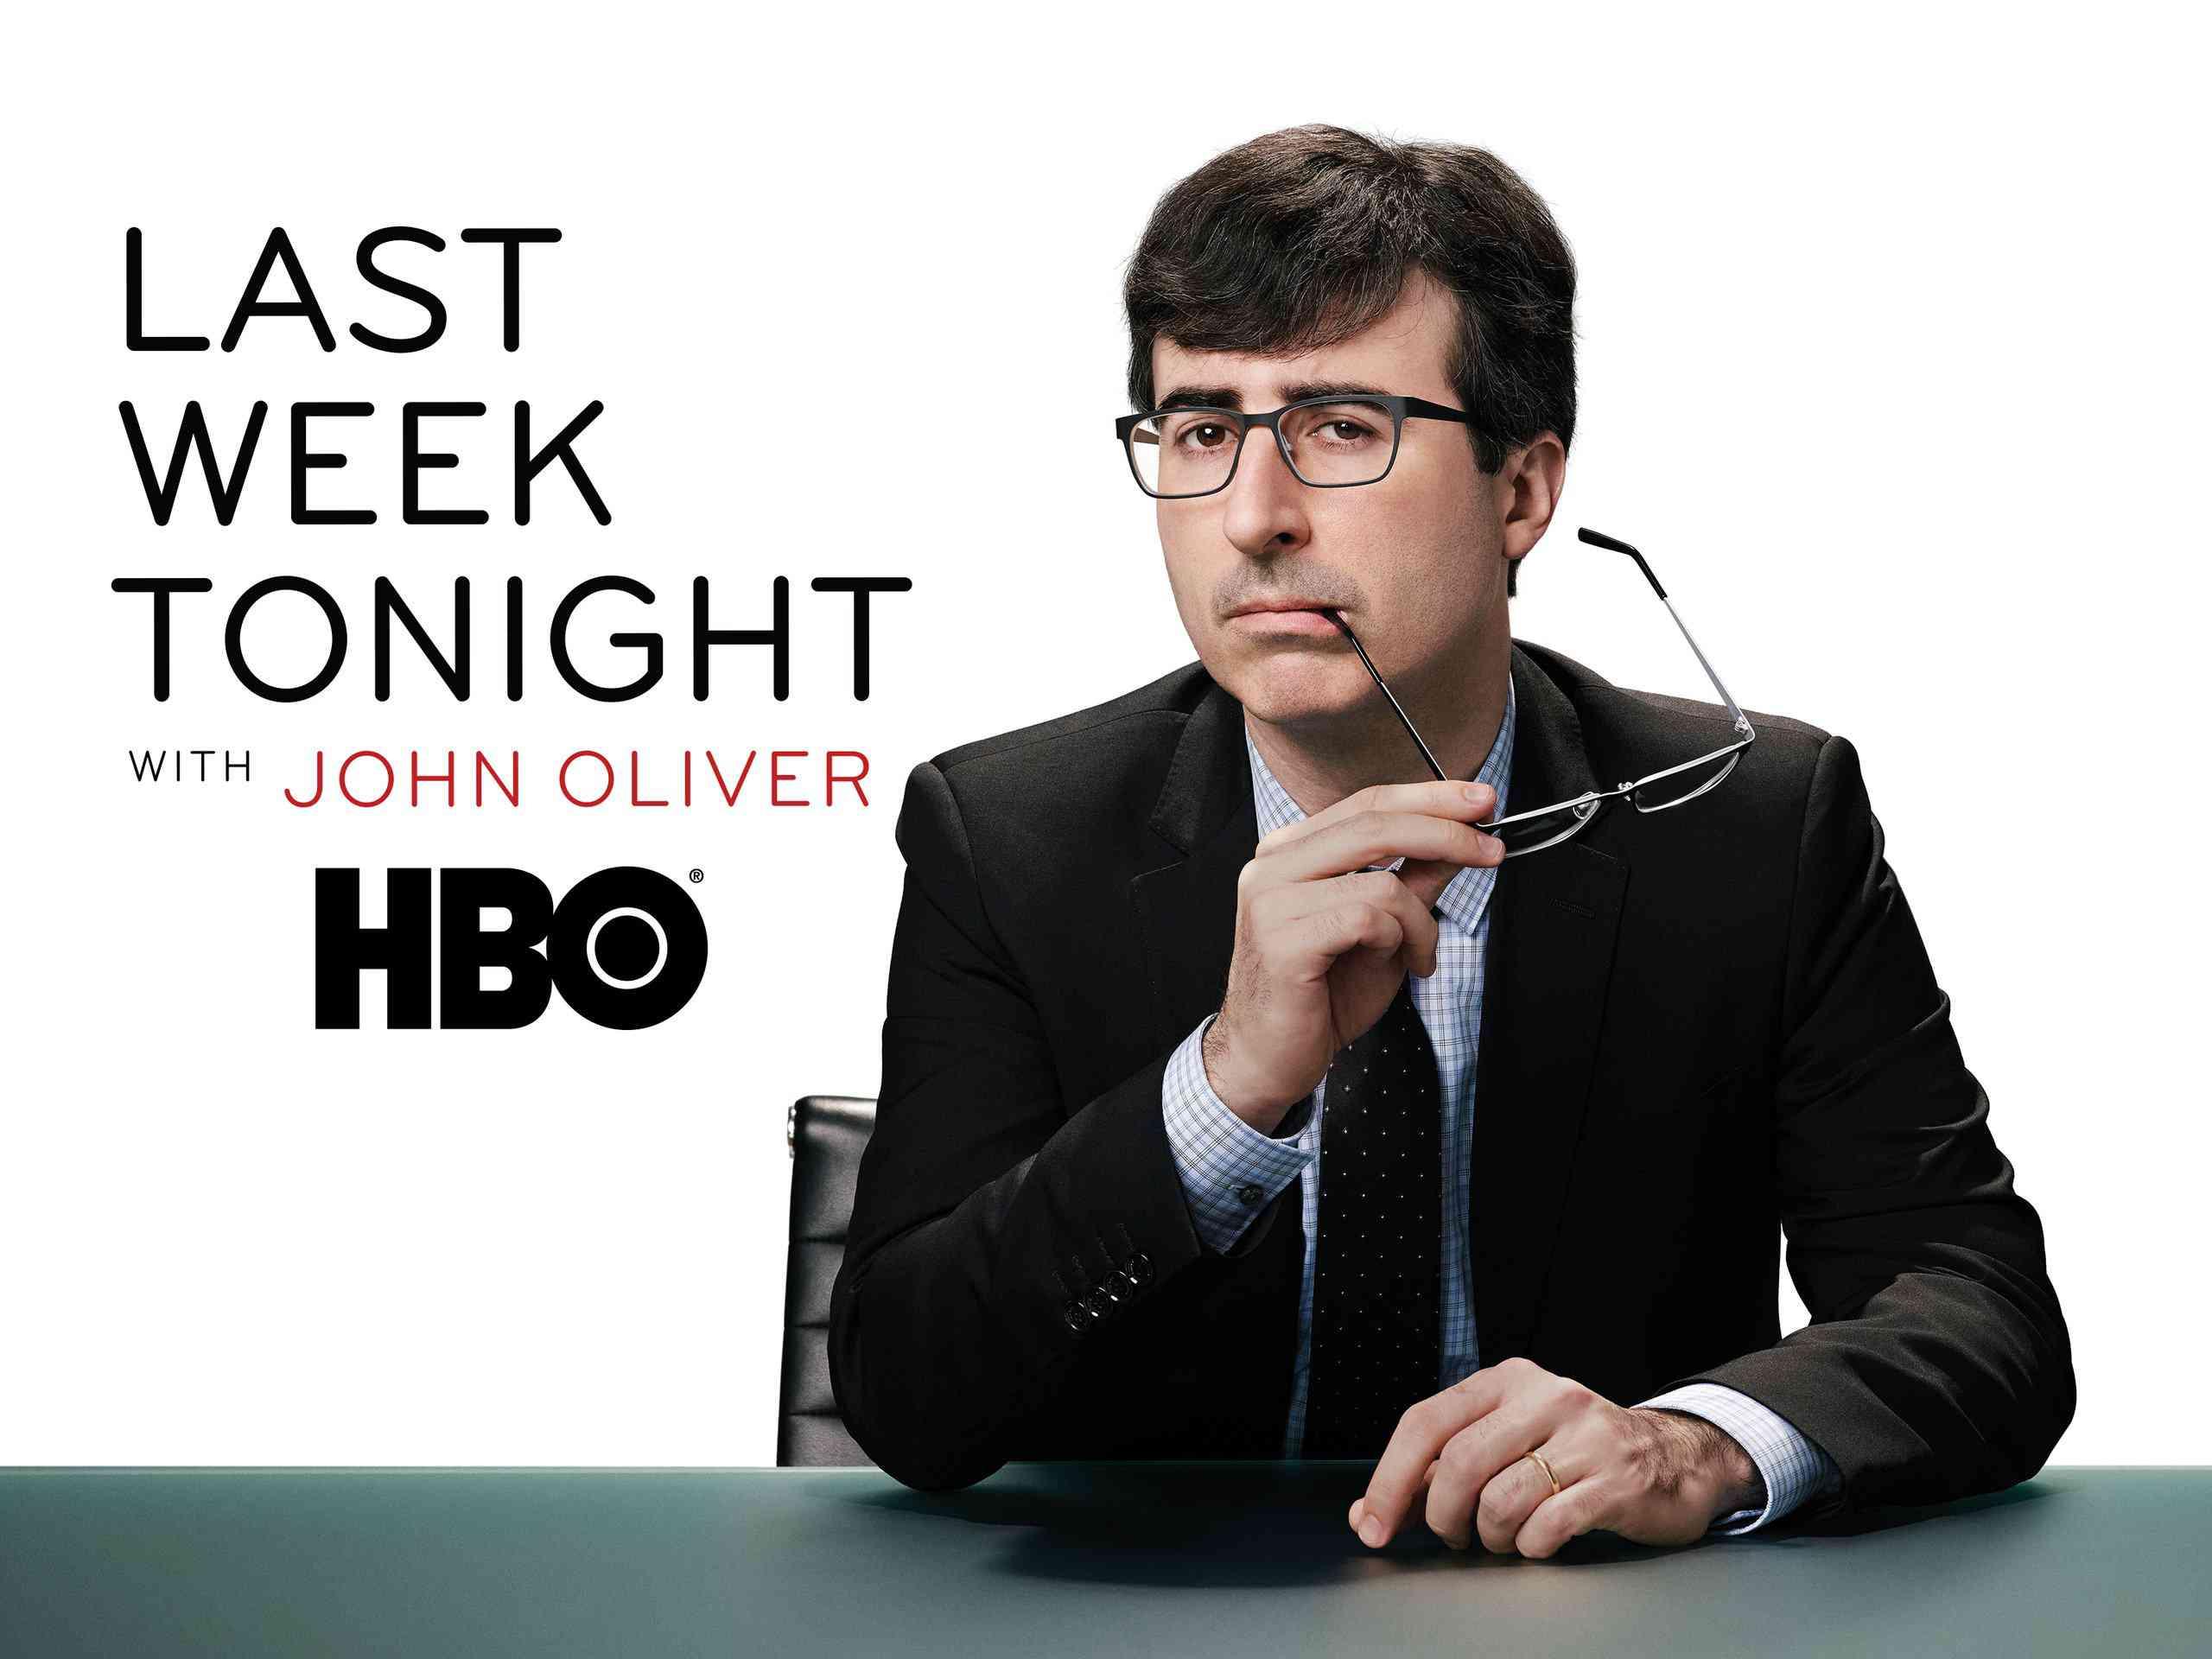 John Oliver in Last Week Tonight